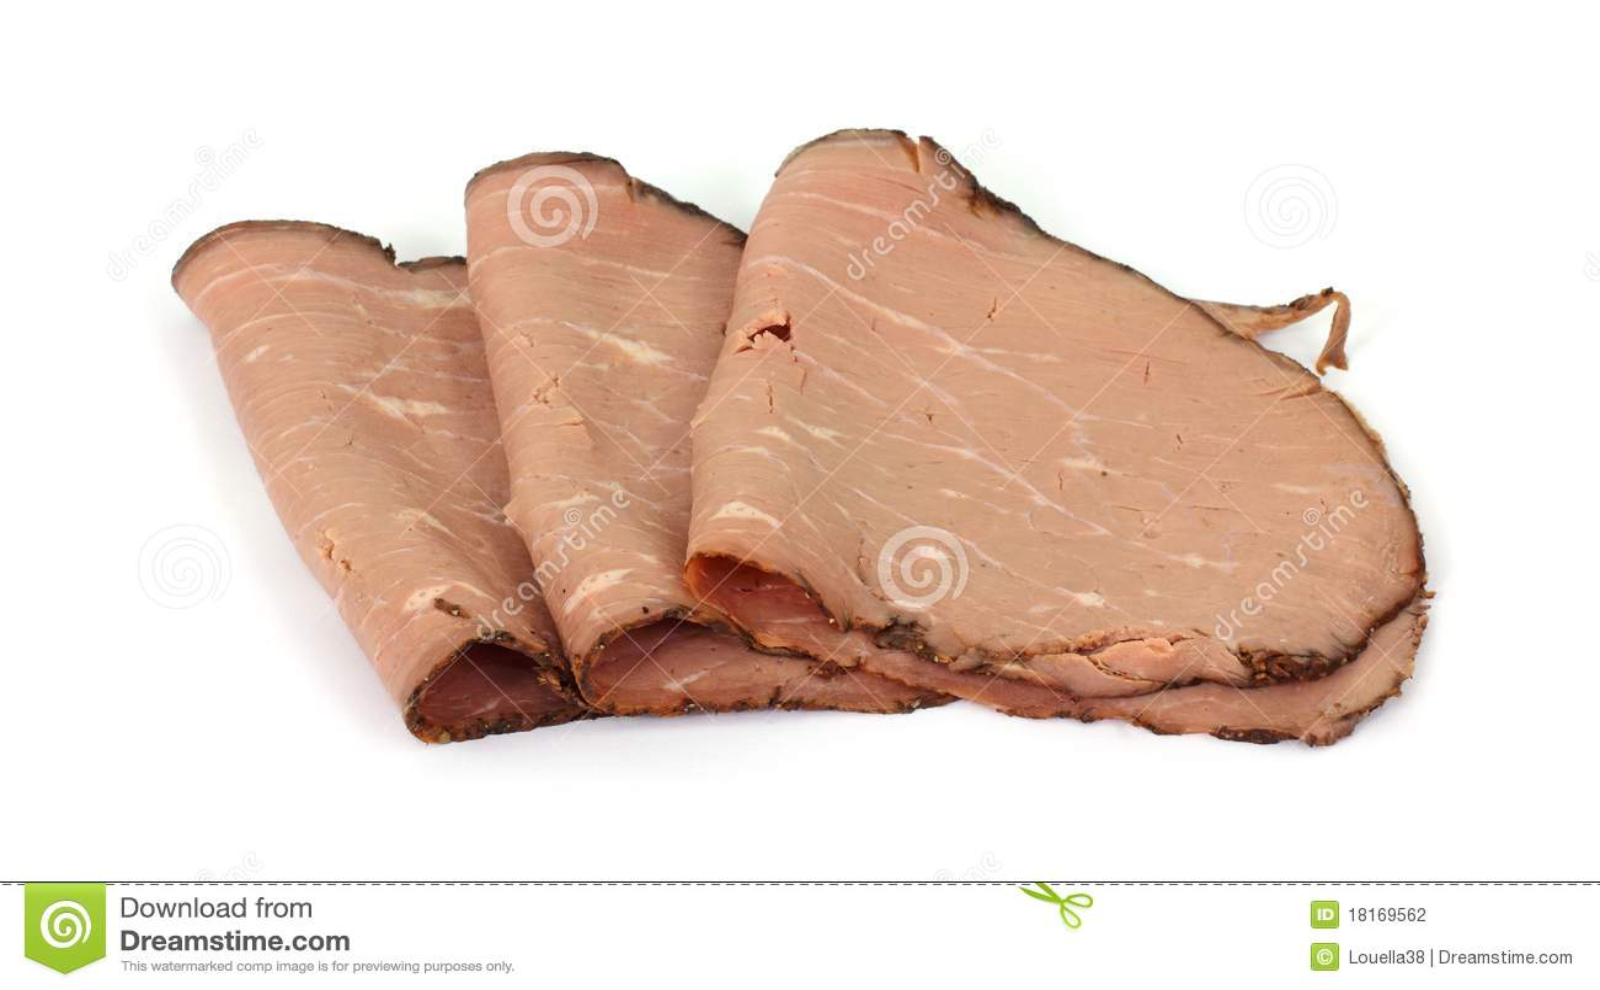 Sliced roast beef package - Lean Roast Beef Slices Arranged Stock Photography